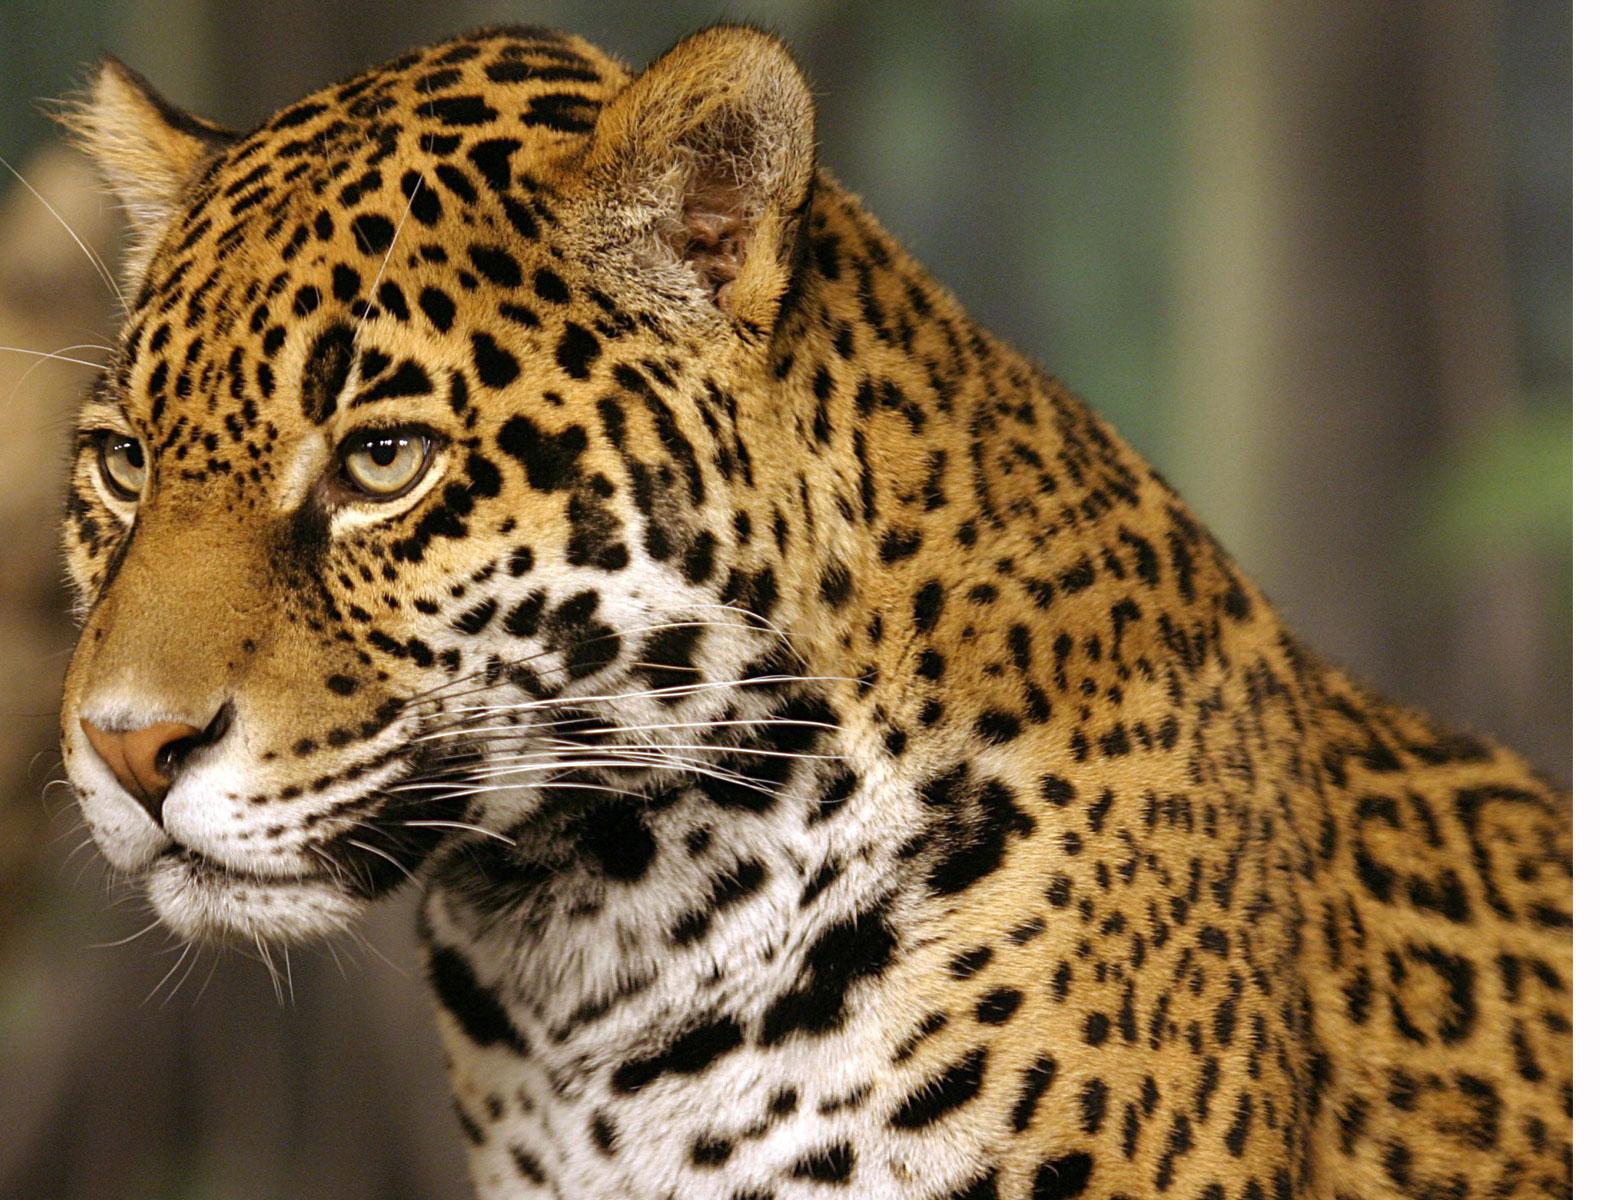 Coloring pages of jaguars printable - Jaguar Cartoon And Printable Jaguar Coloring Pages